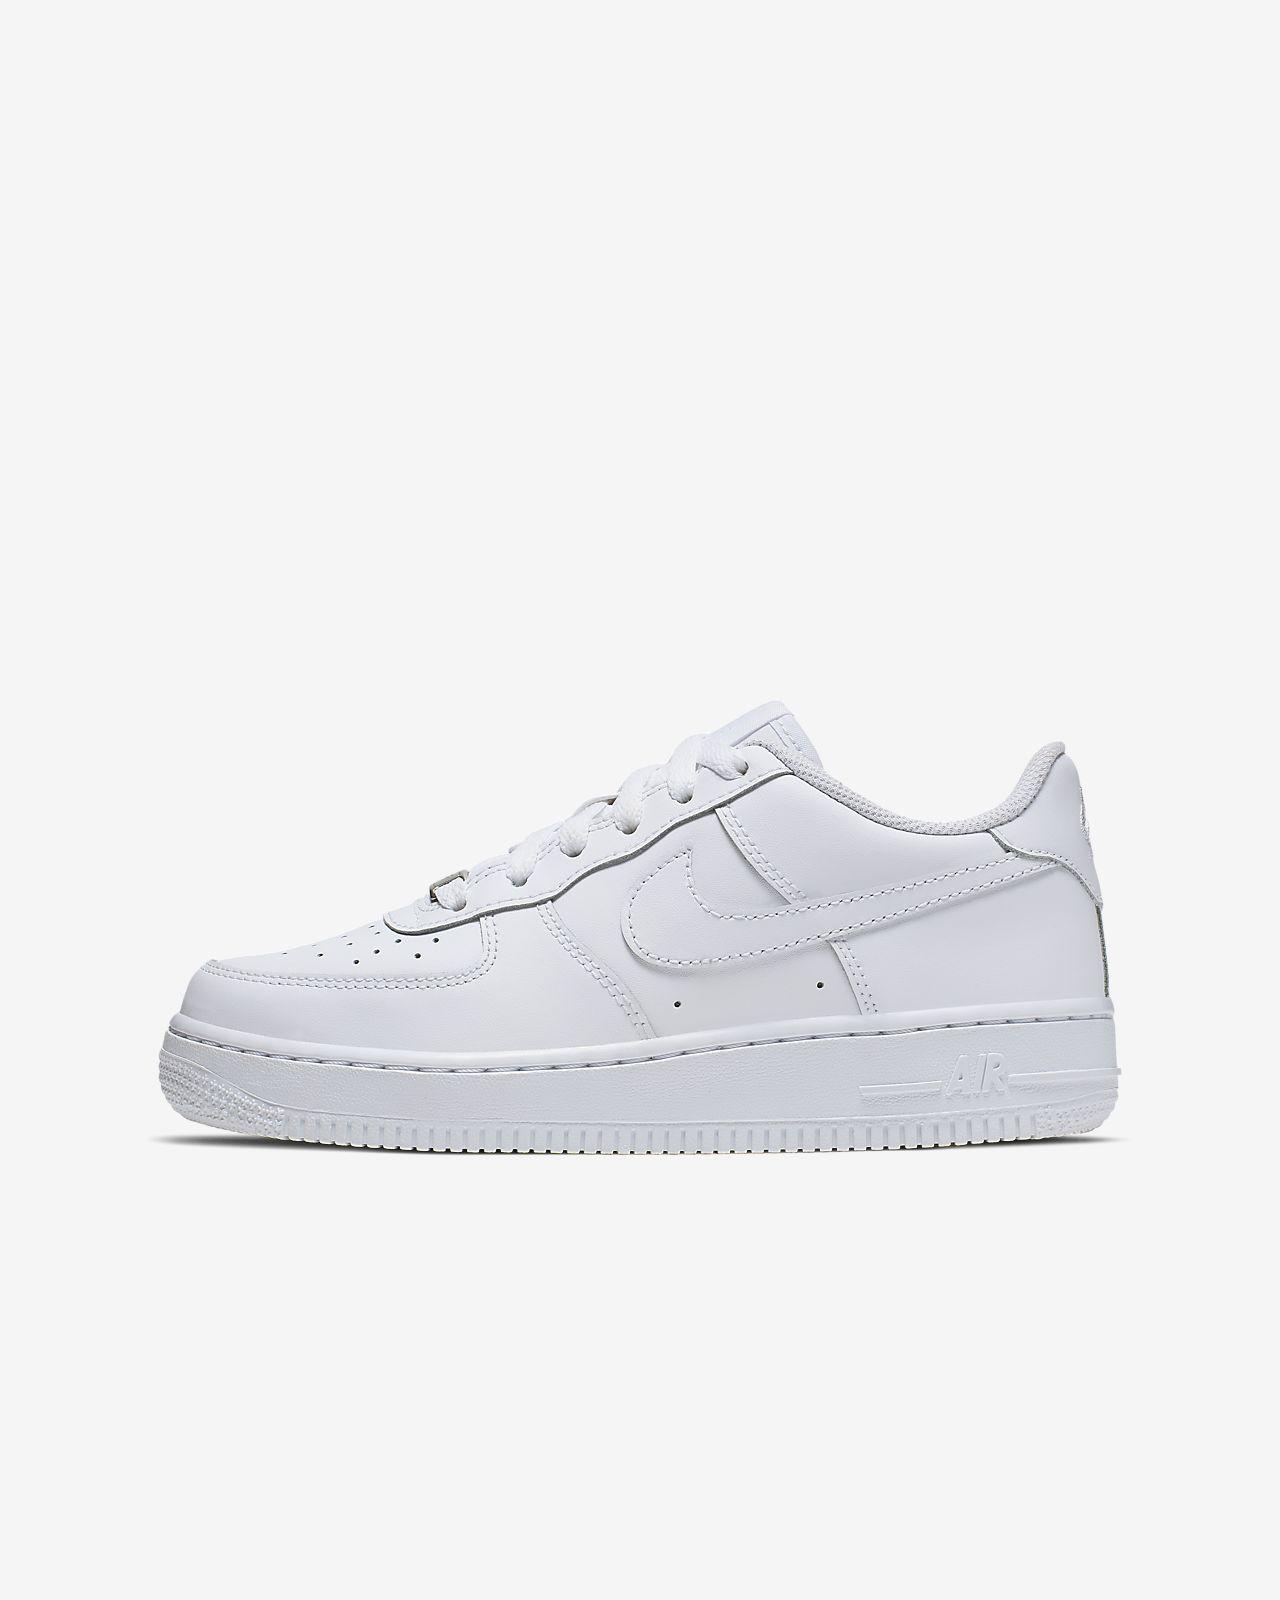 Sko Nike Air Force 1 Triple White för ungdom